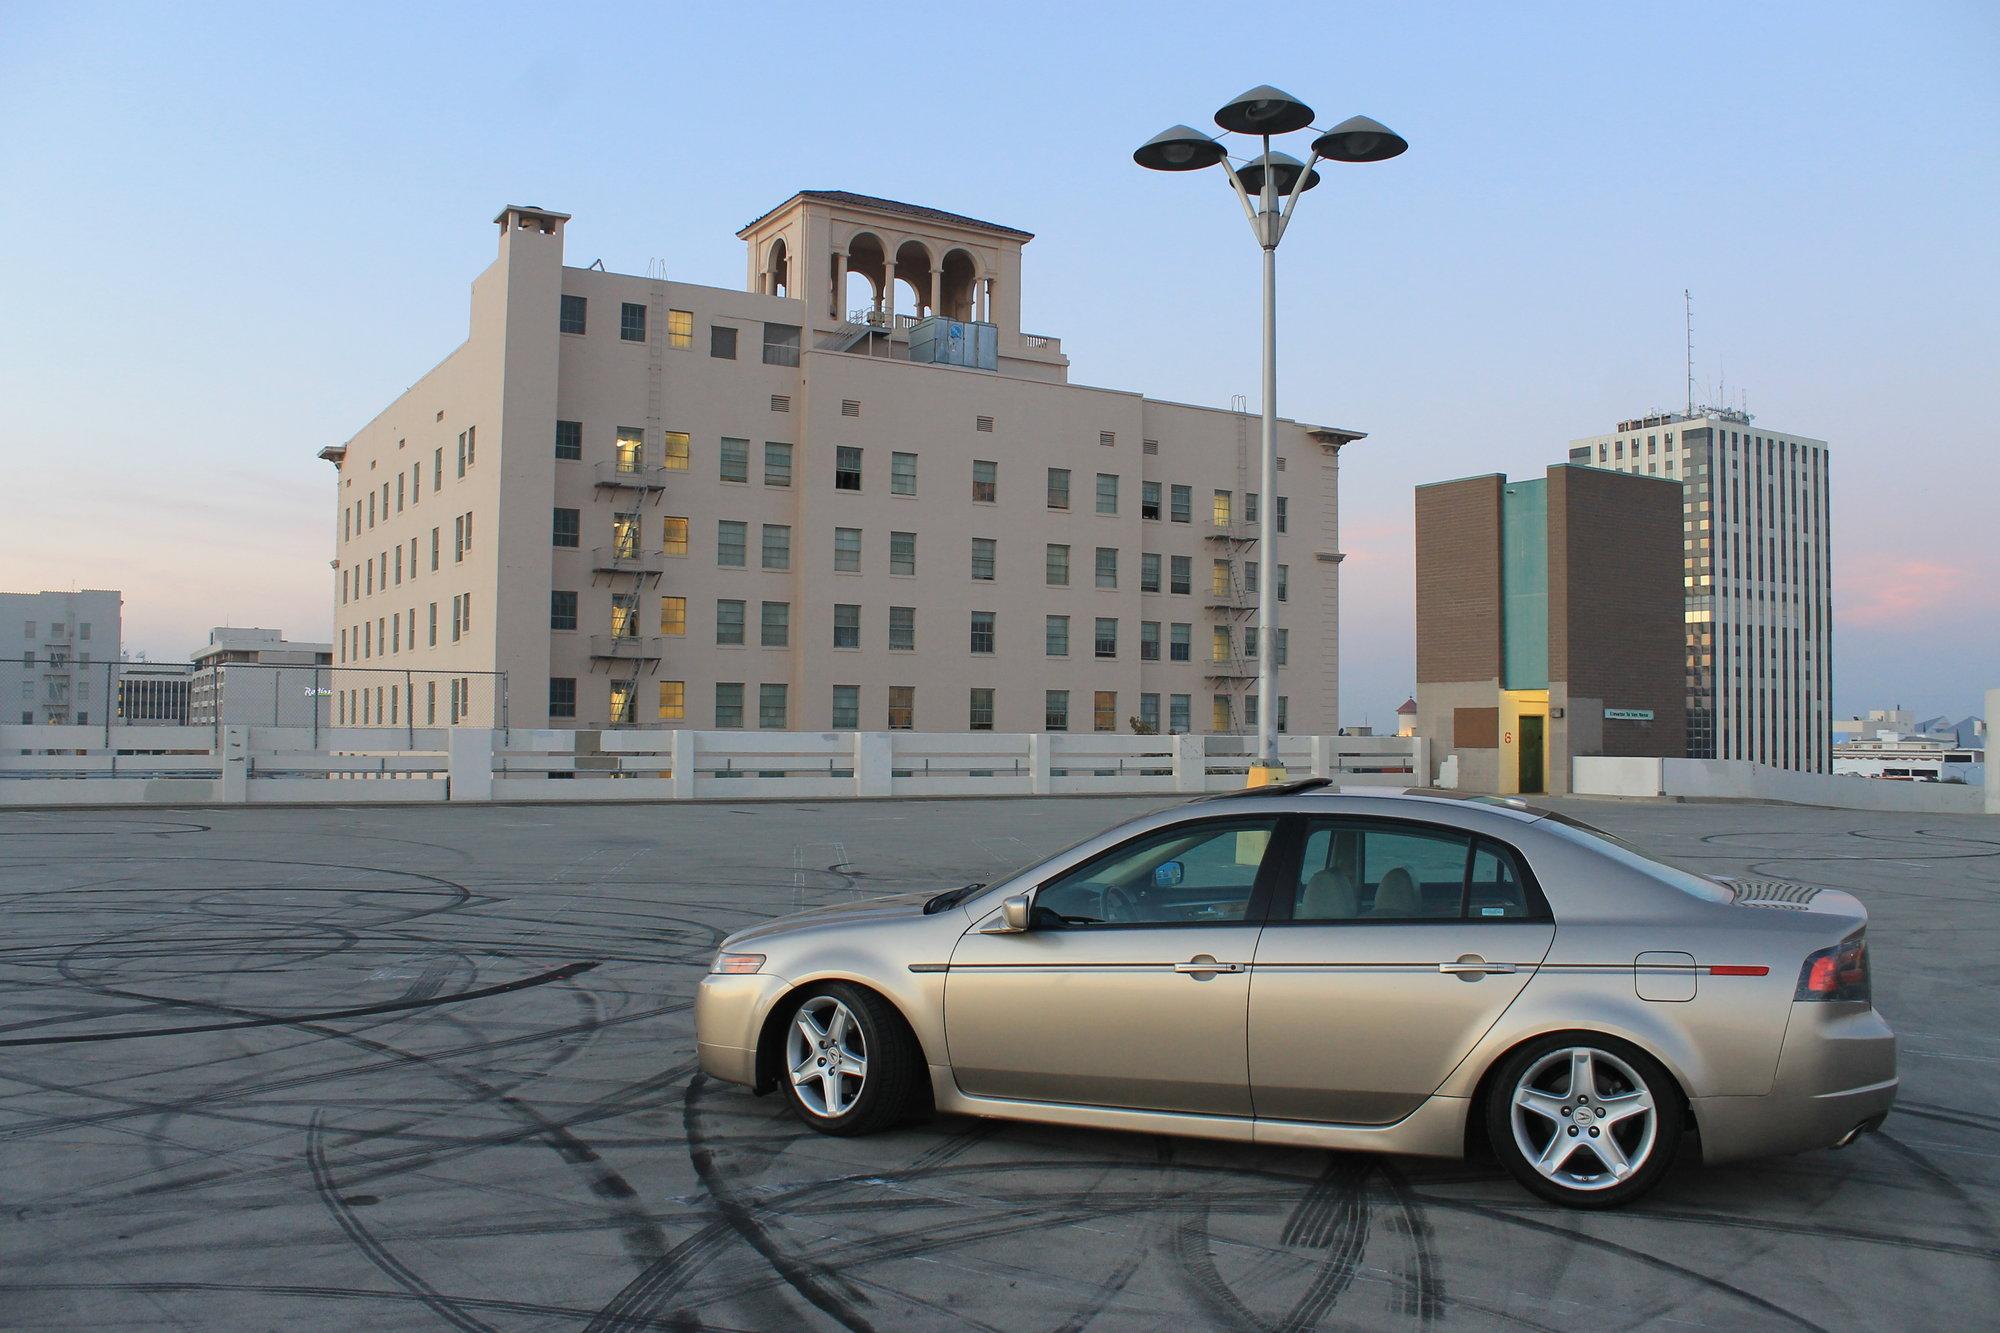 2006 Acura TL transmission problems - AcuraZine - Acura